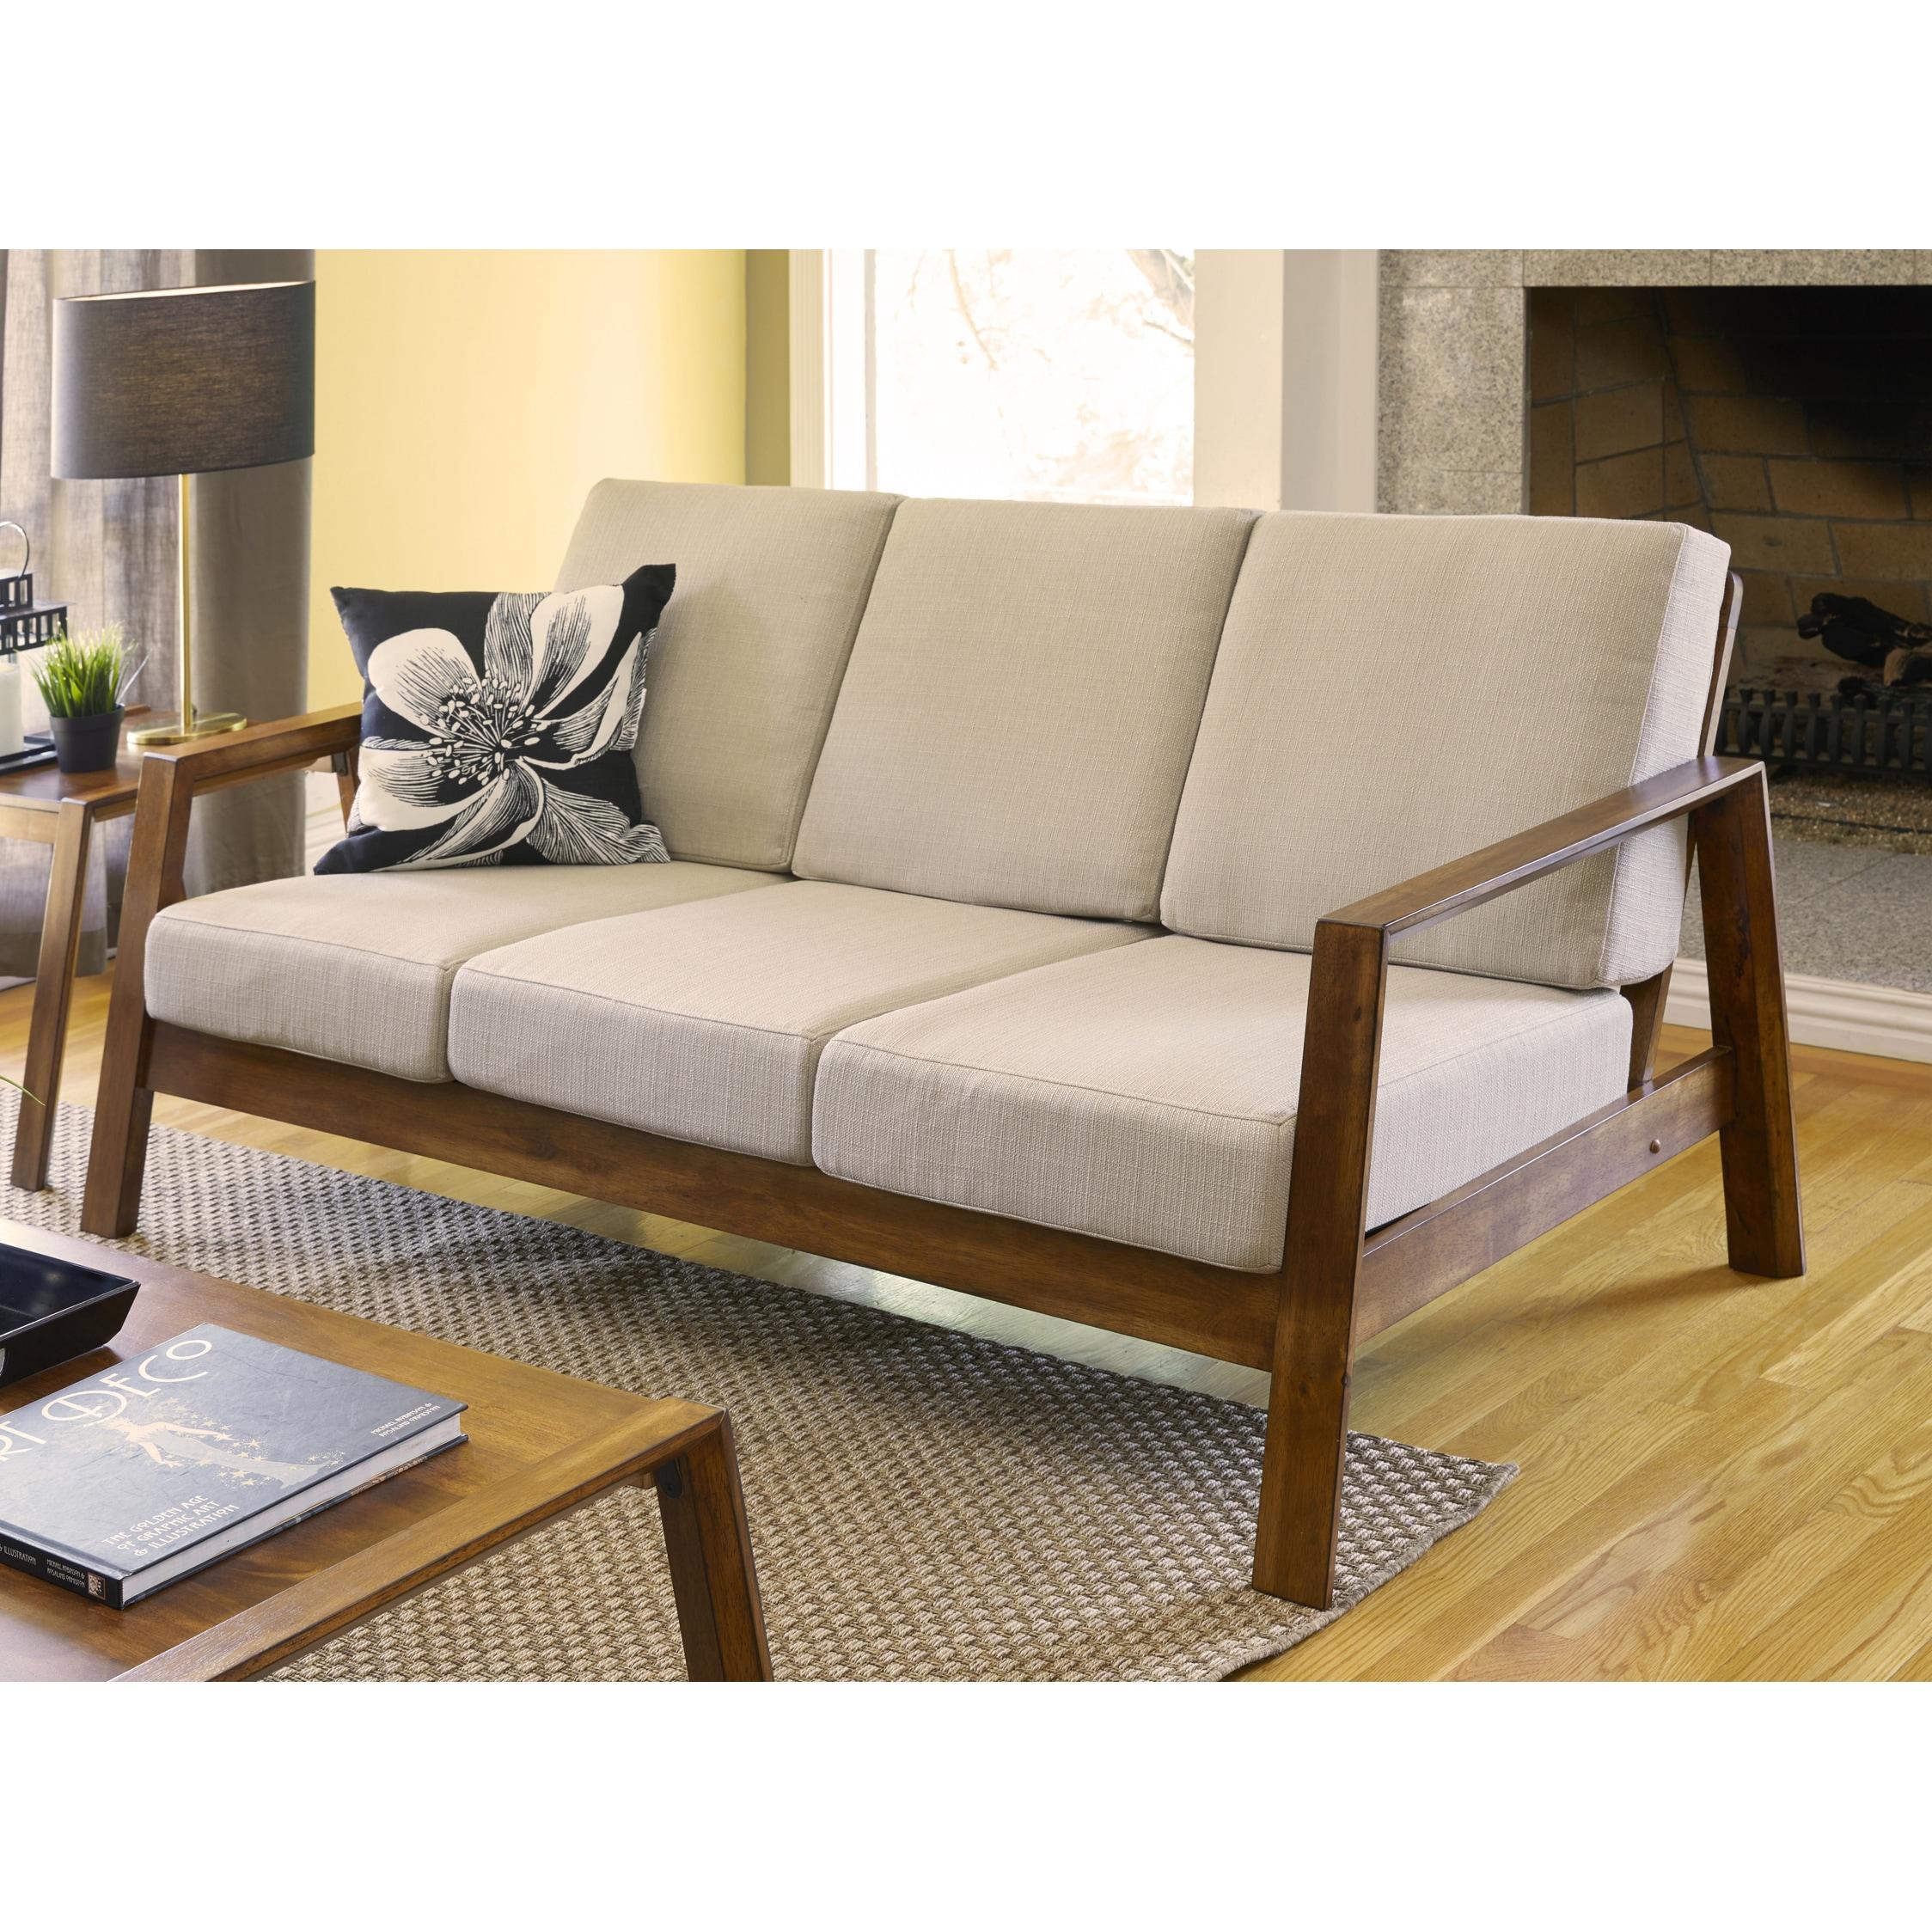 Carson Carrington Horuphav Mid Century Modern Barley Tan Linen Sofa With Exposed Wood Frame